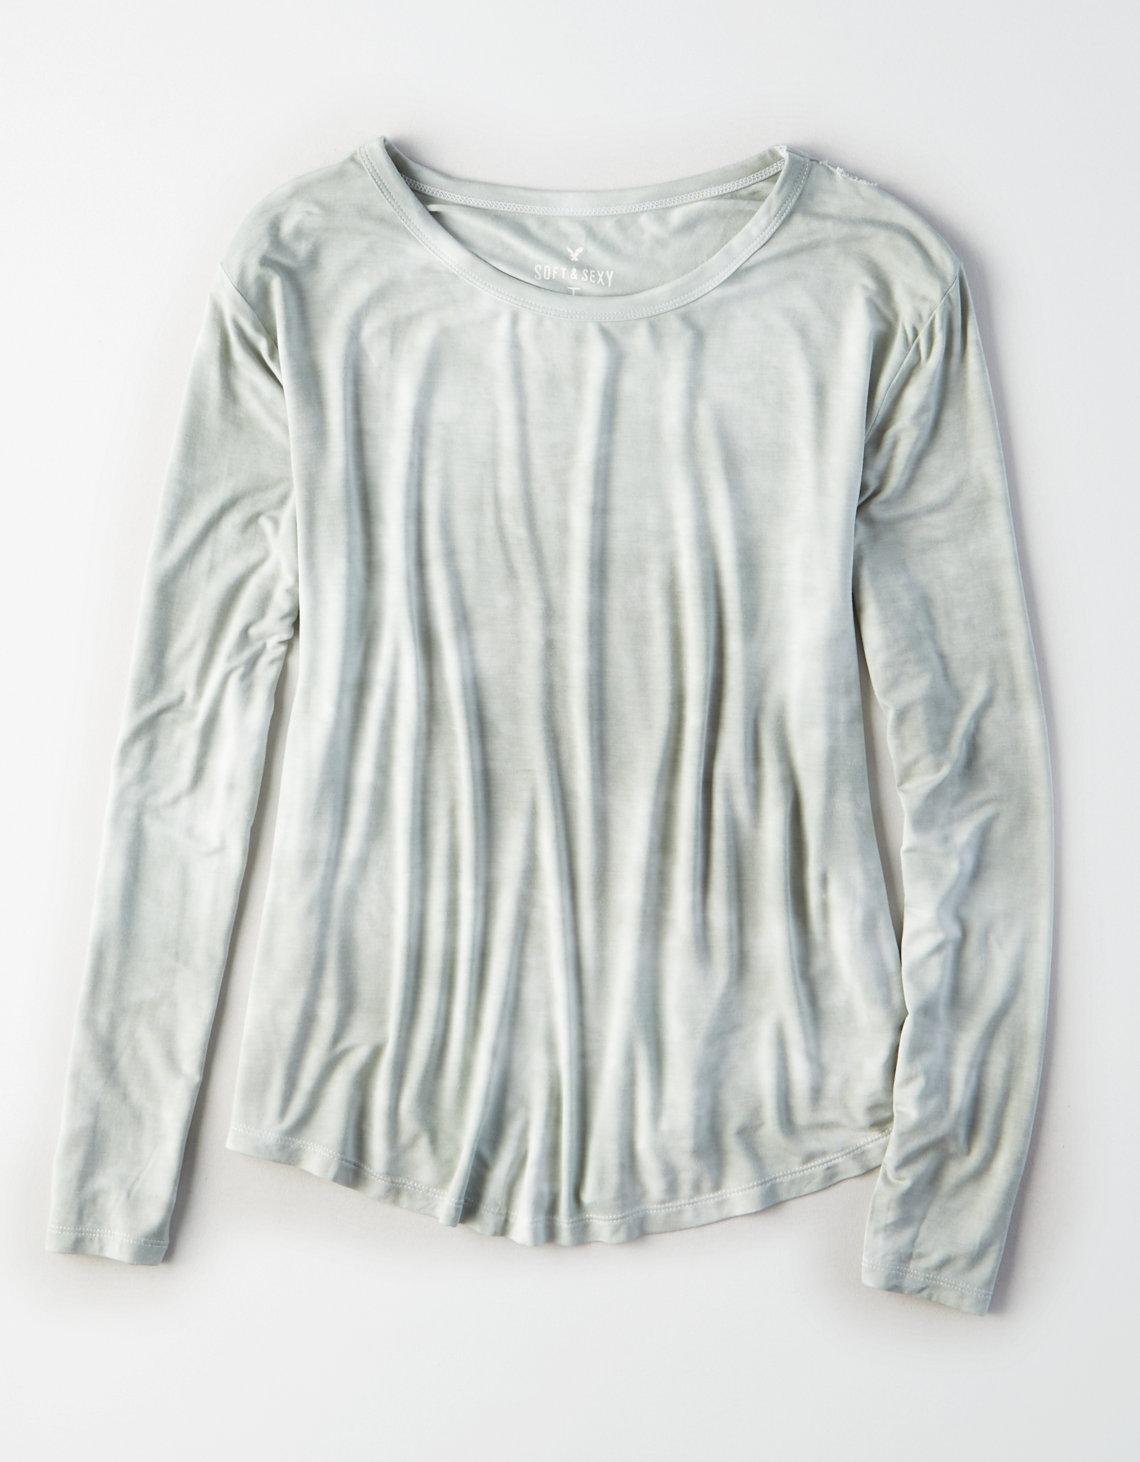 AE Soft & Sexy Long-Sleeve Favorite T-Shirt